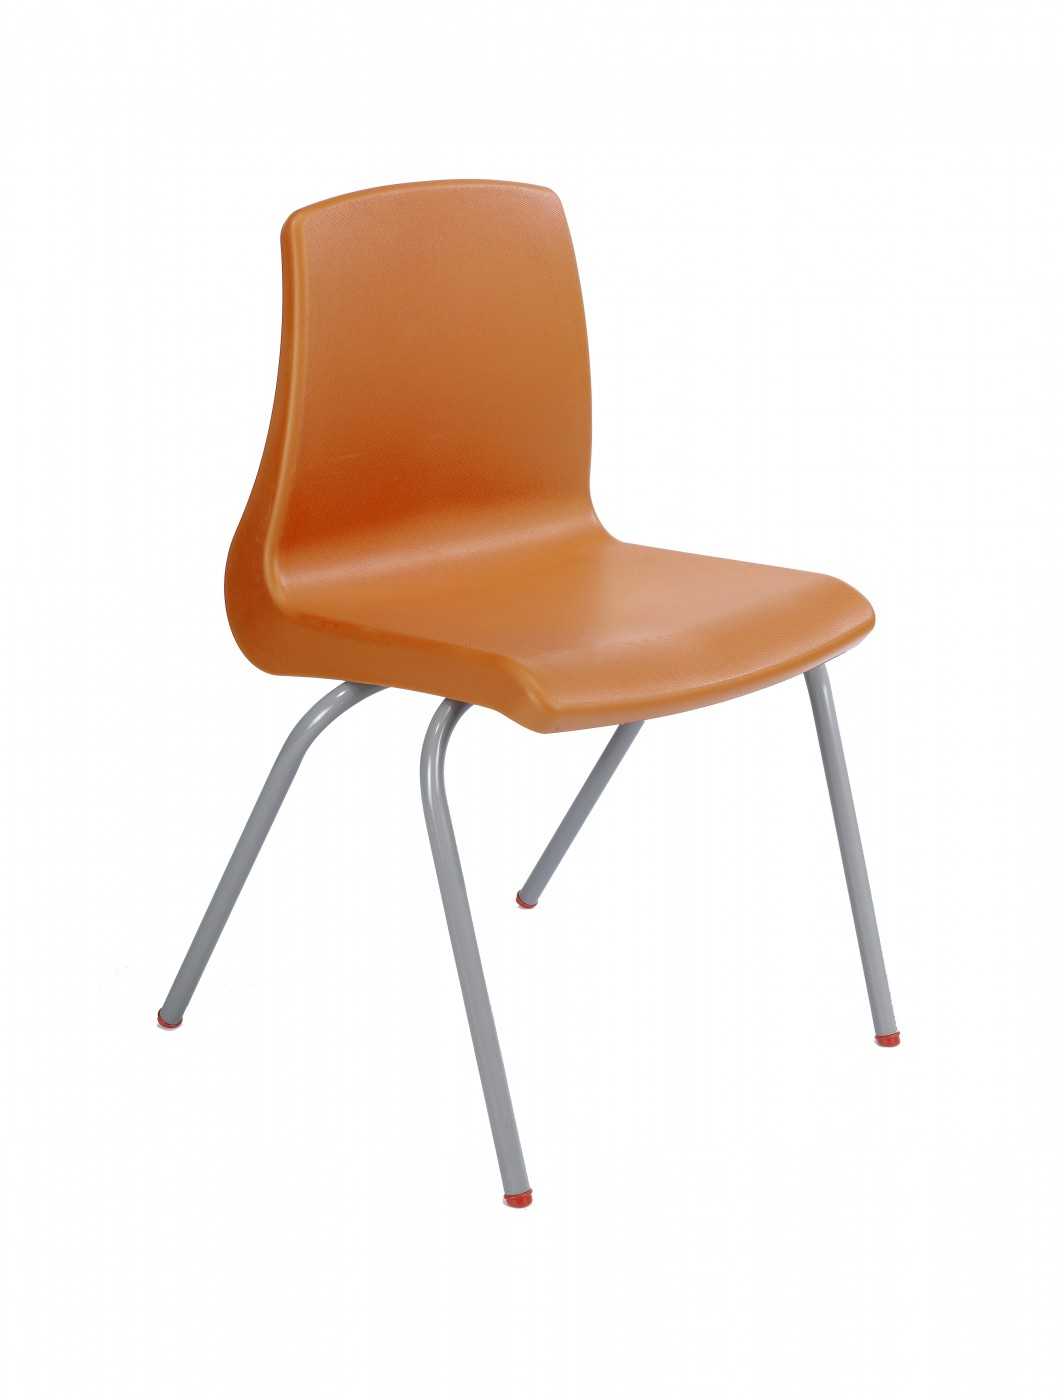 Metalliform NP1 Stacking Classroom Chair | 121 Office